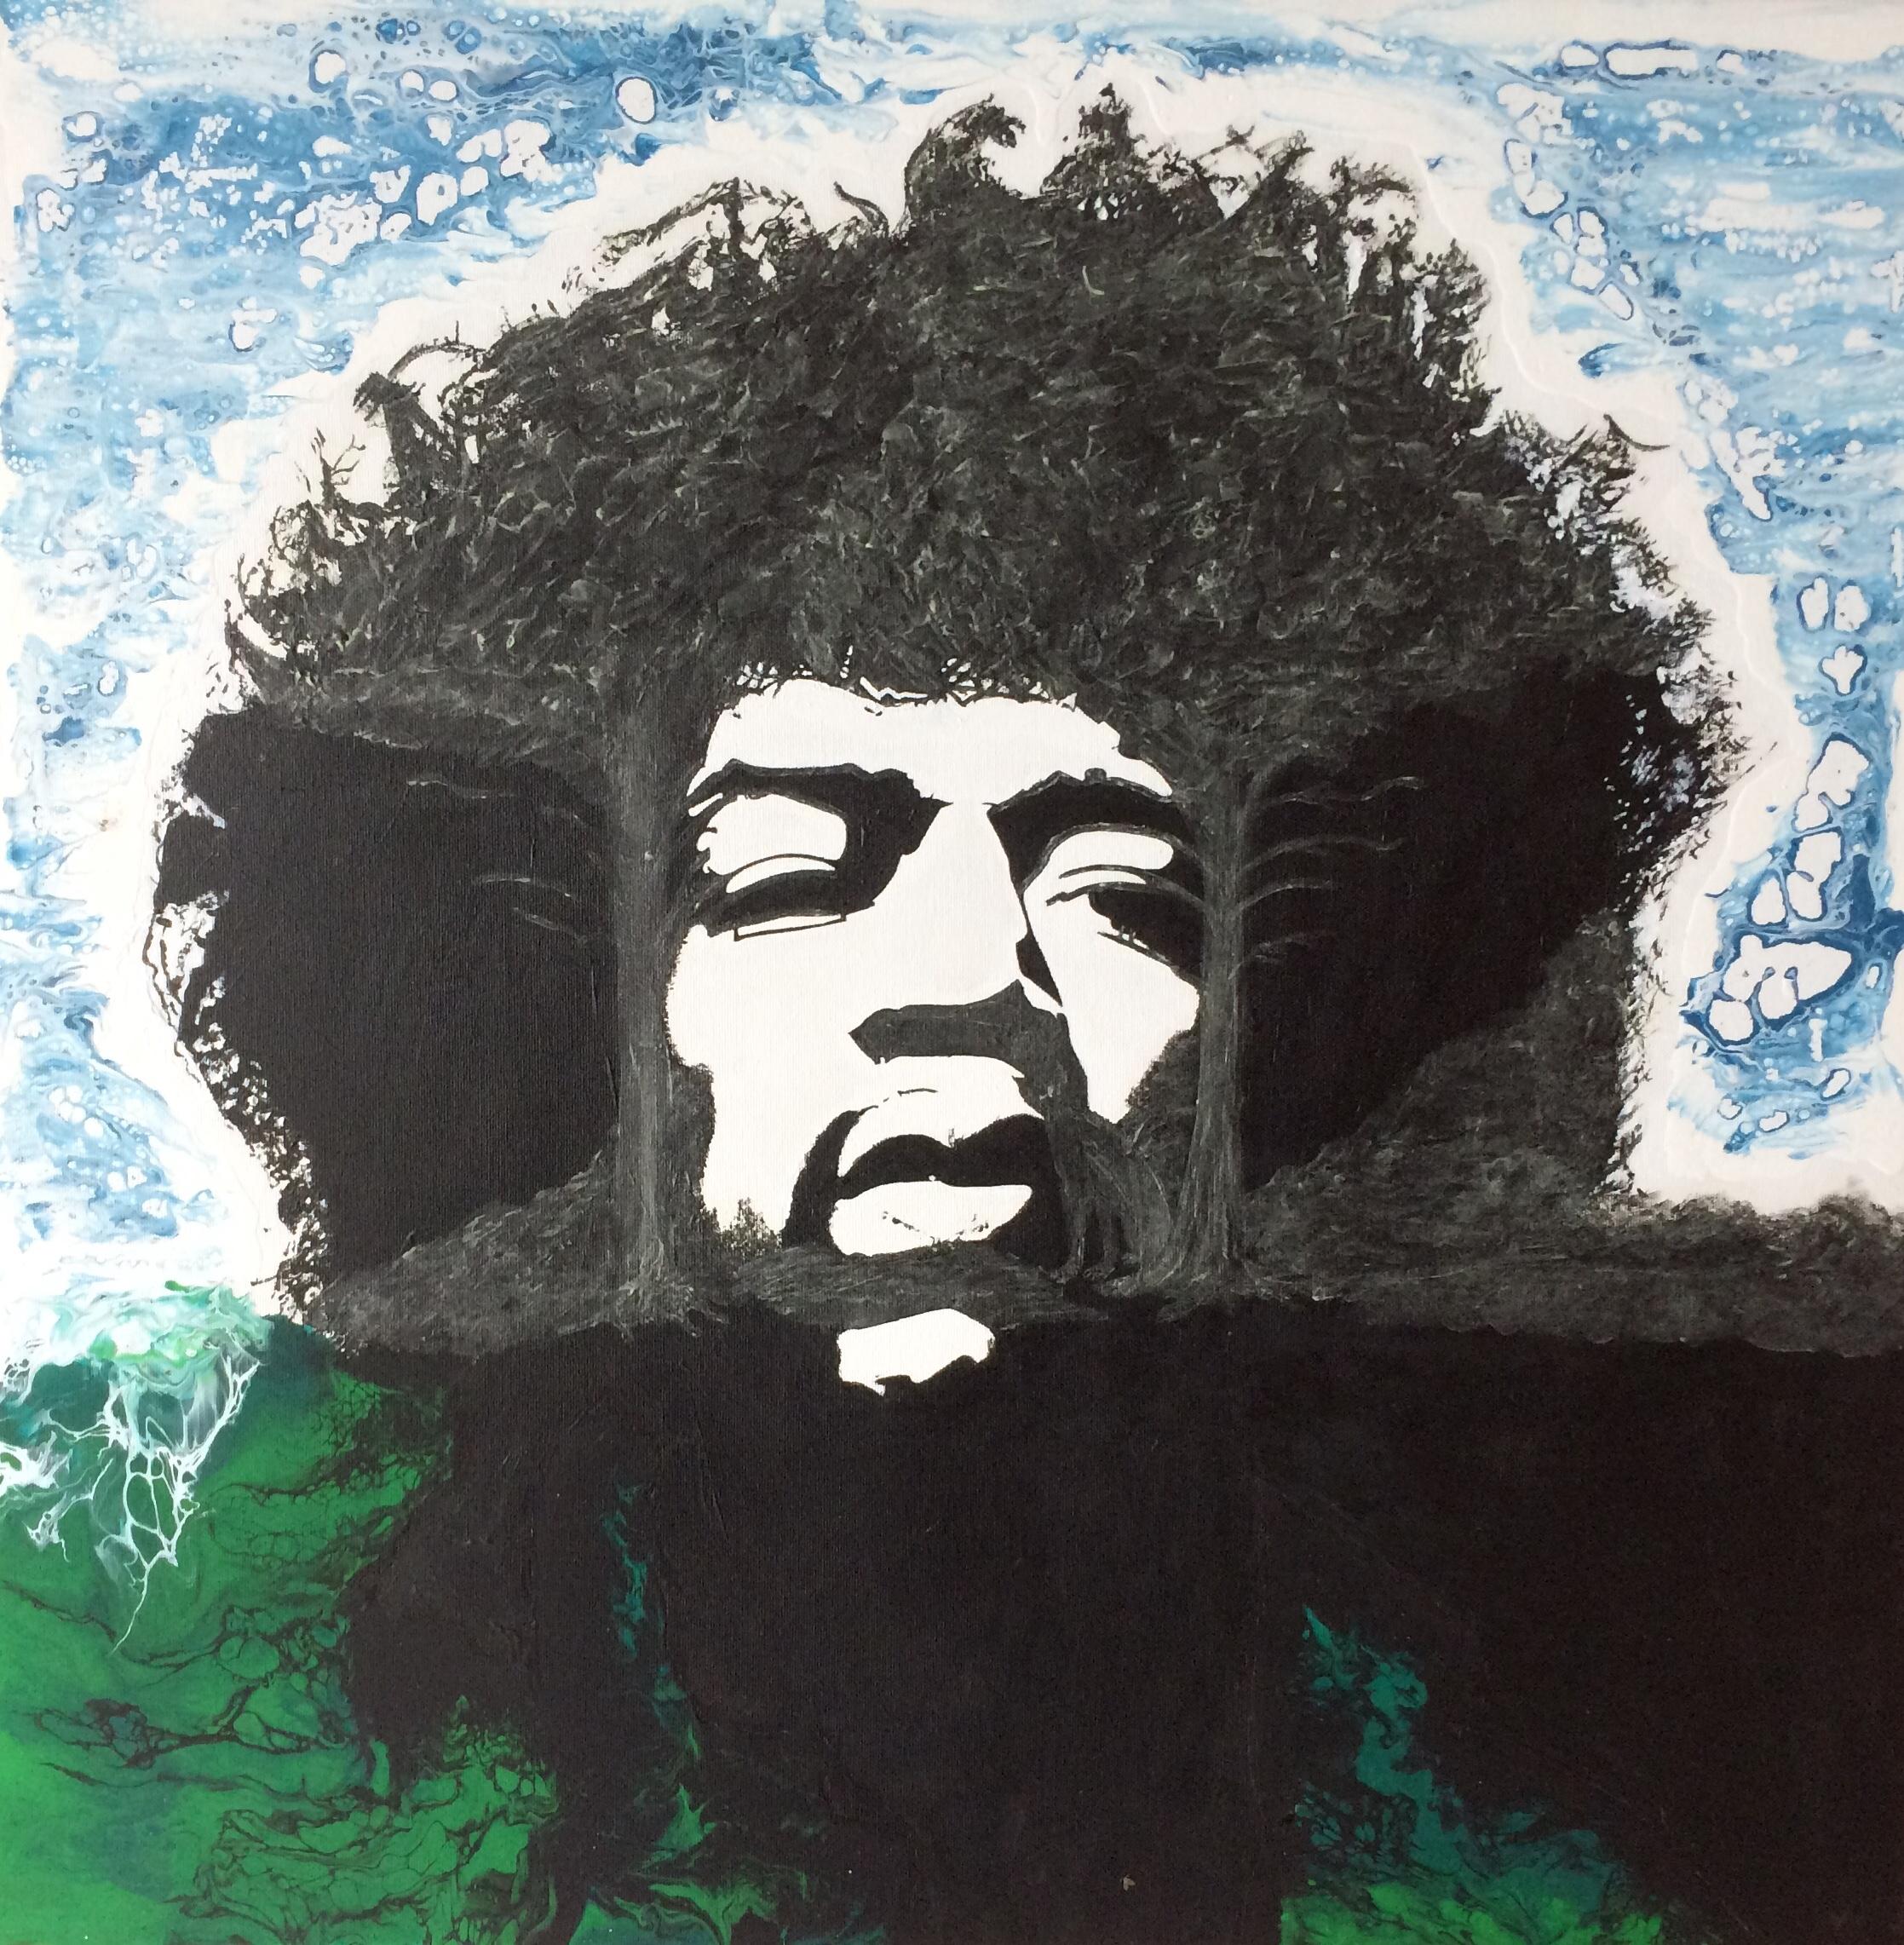 Le foreste di Woodstock-quadro-DanielaMusone-Sounvasart